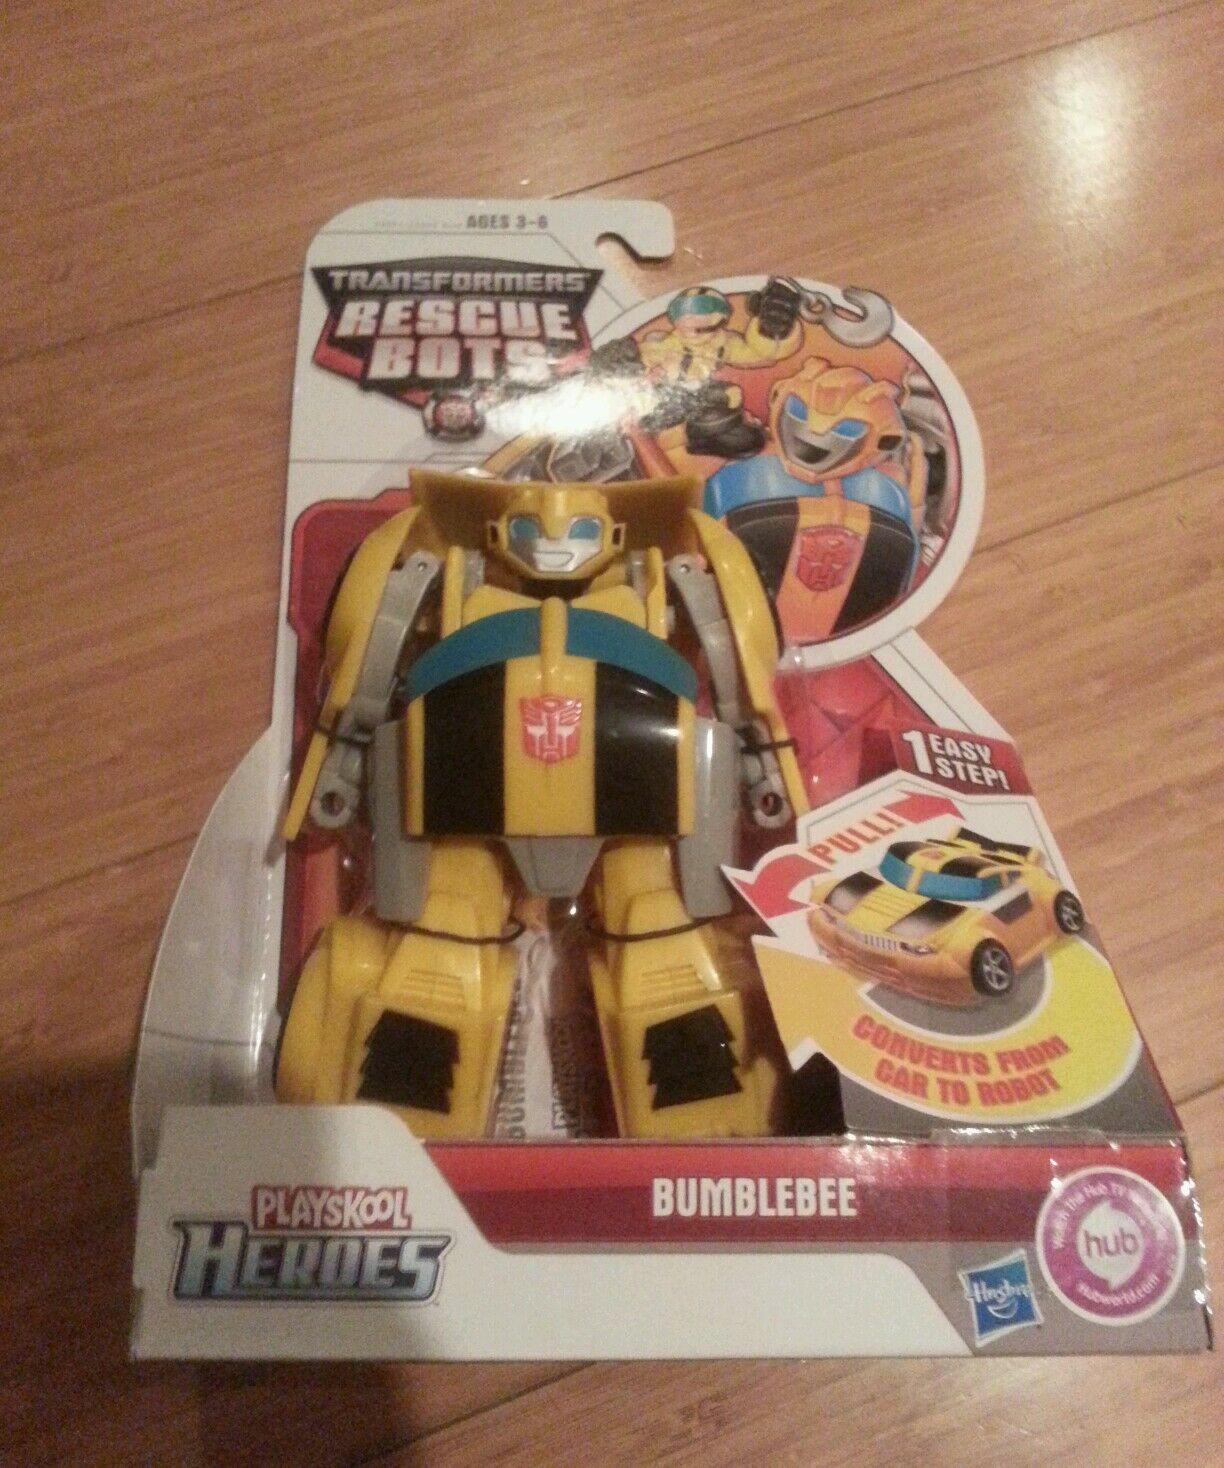 de moda Transformers Rescue Bot-Bumblebee Bot-Bumblebee Bot-Bumblebee Playskool Figura De Acción Edición Original  calidad auténtica